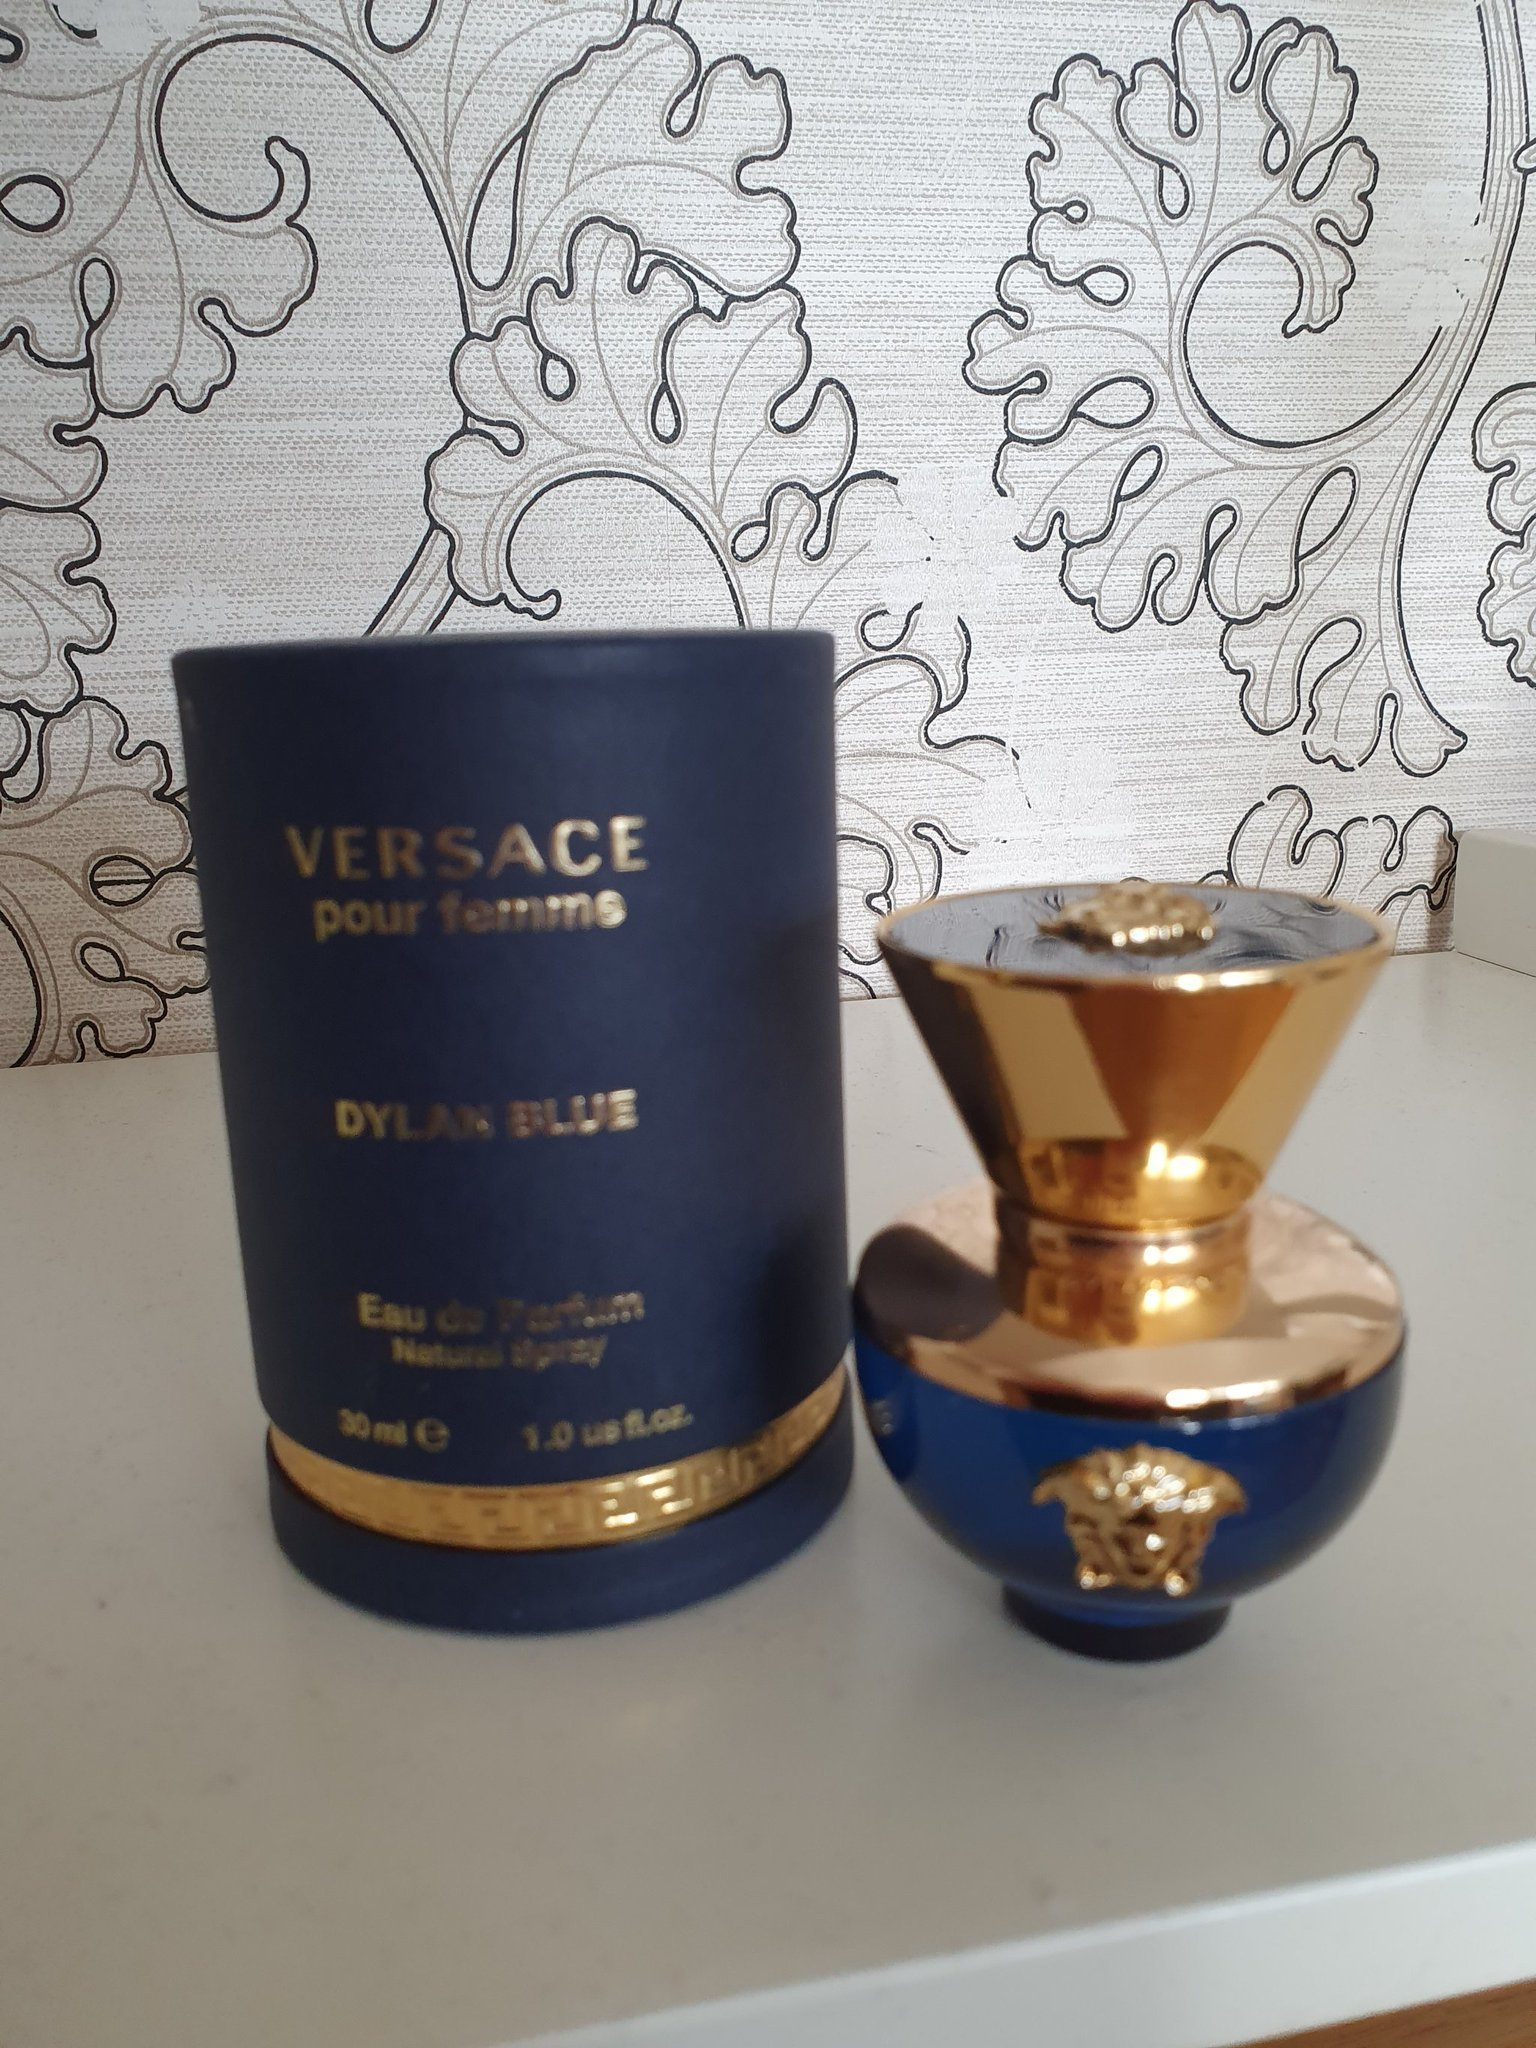 Dylan Blue Pour Femme EdP 50 ml Versace KICKS